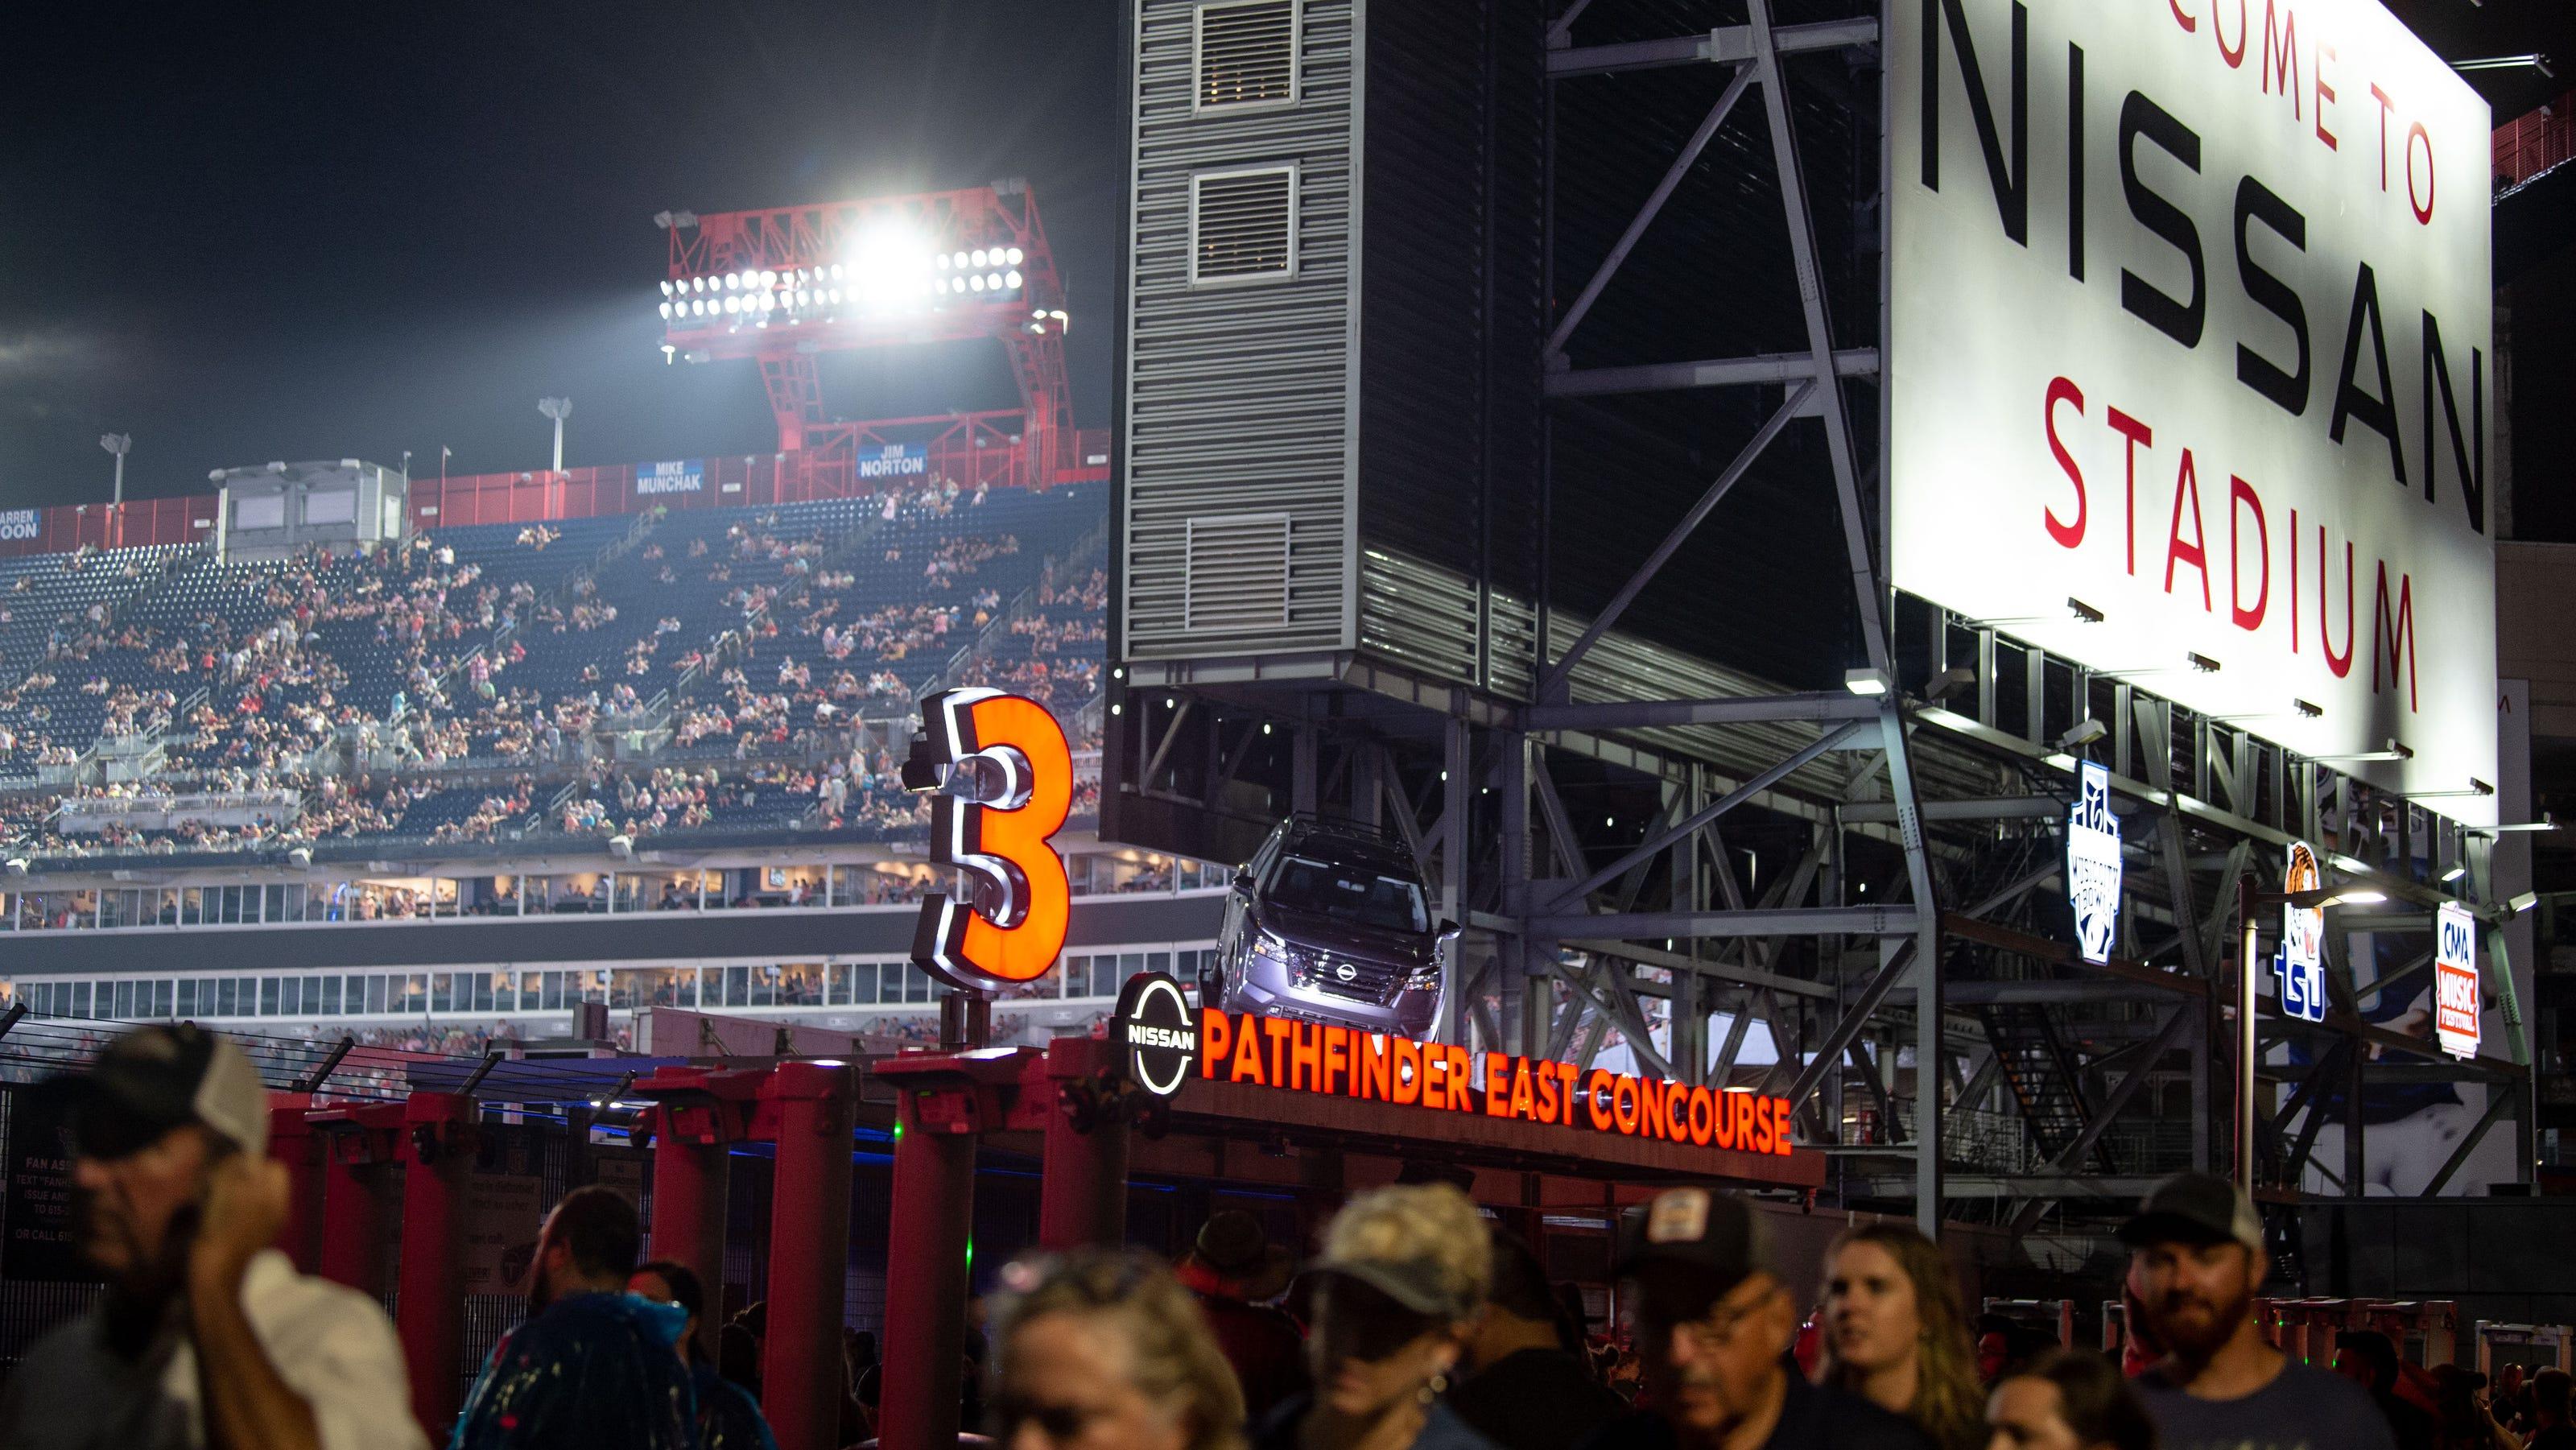 Garth Brooks concert at Nissan Stadium postponed due to severe weather - Tennessean